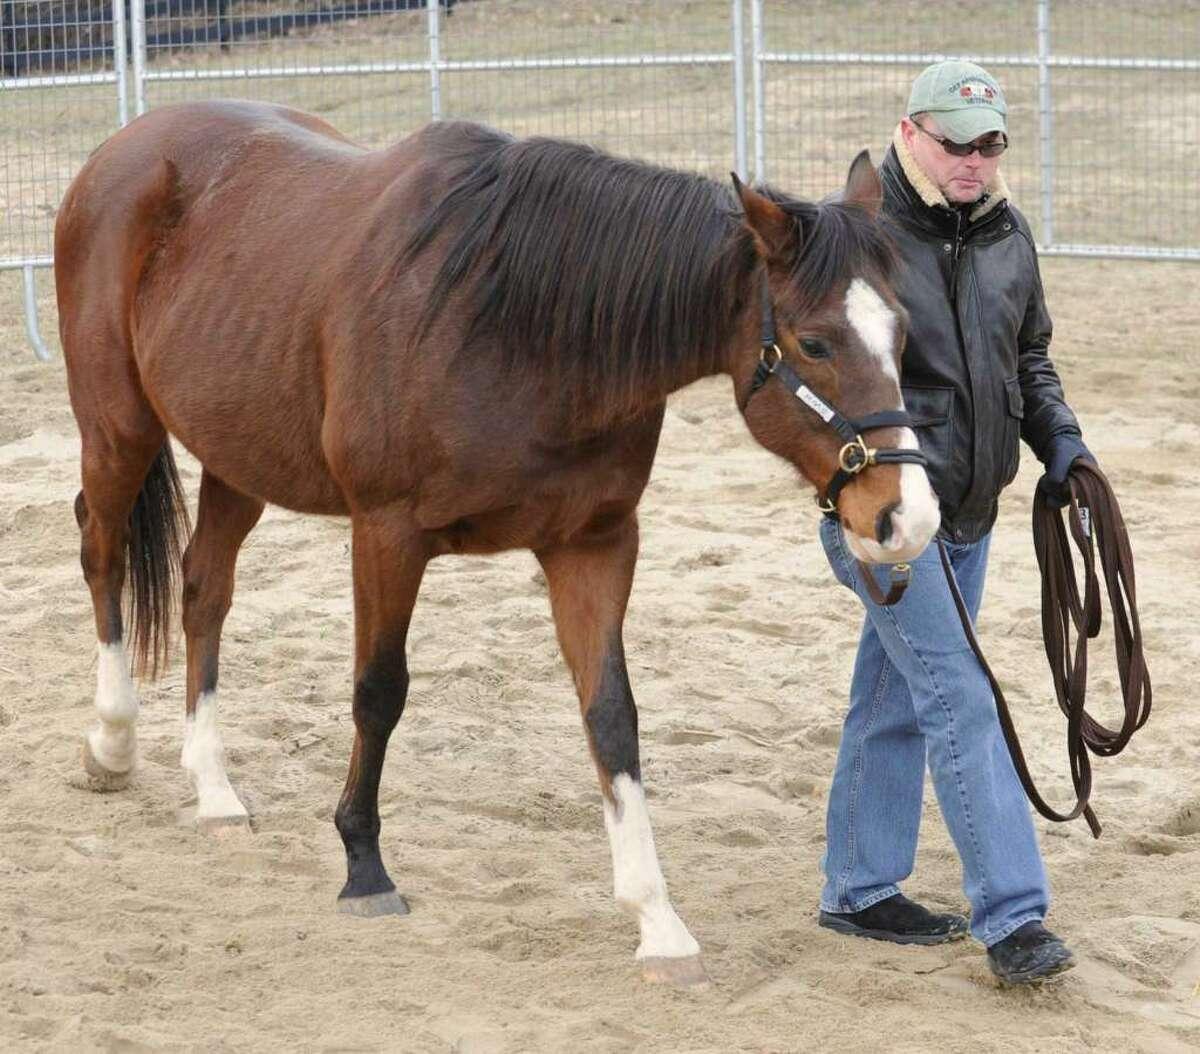 Lori Van Buren / Times Union Archive Army veteran Bill Bliss of Wilton bonds with a horse as part of Saratoga WarHorse program in Wilton.